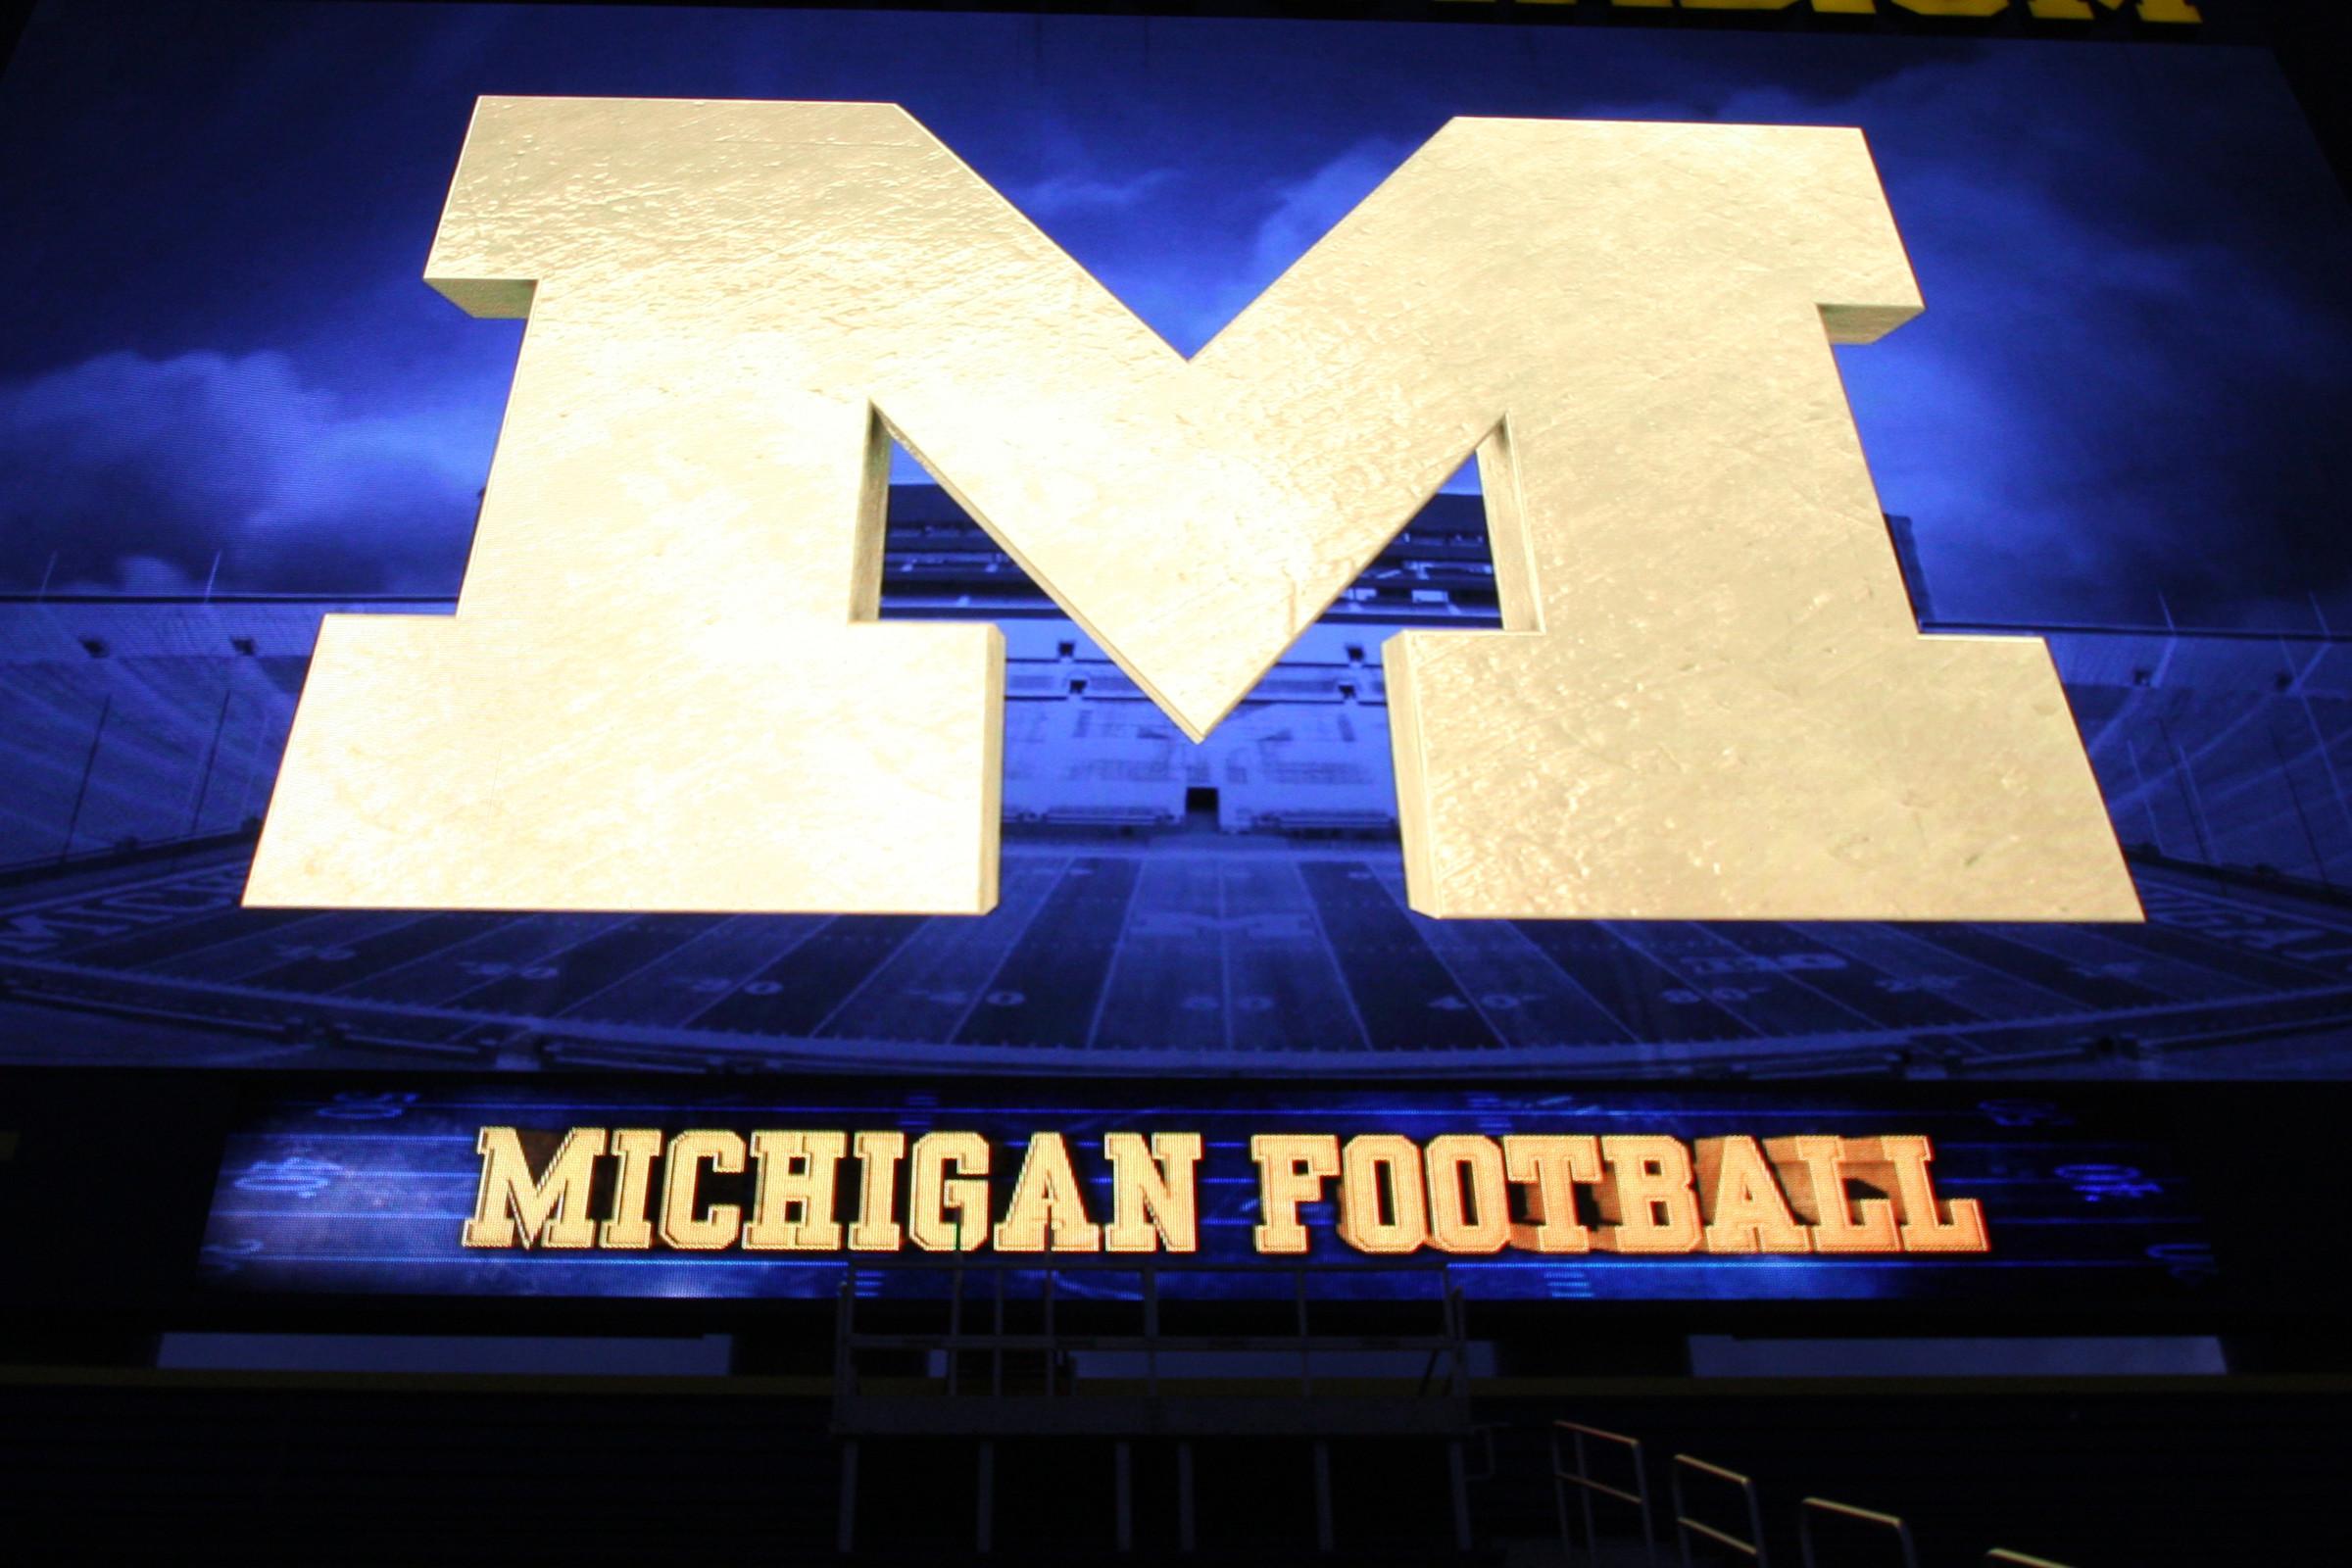 Michigan Football Image Wallpaper | Wallsev.com – Download Free HD .